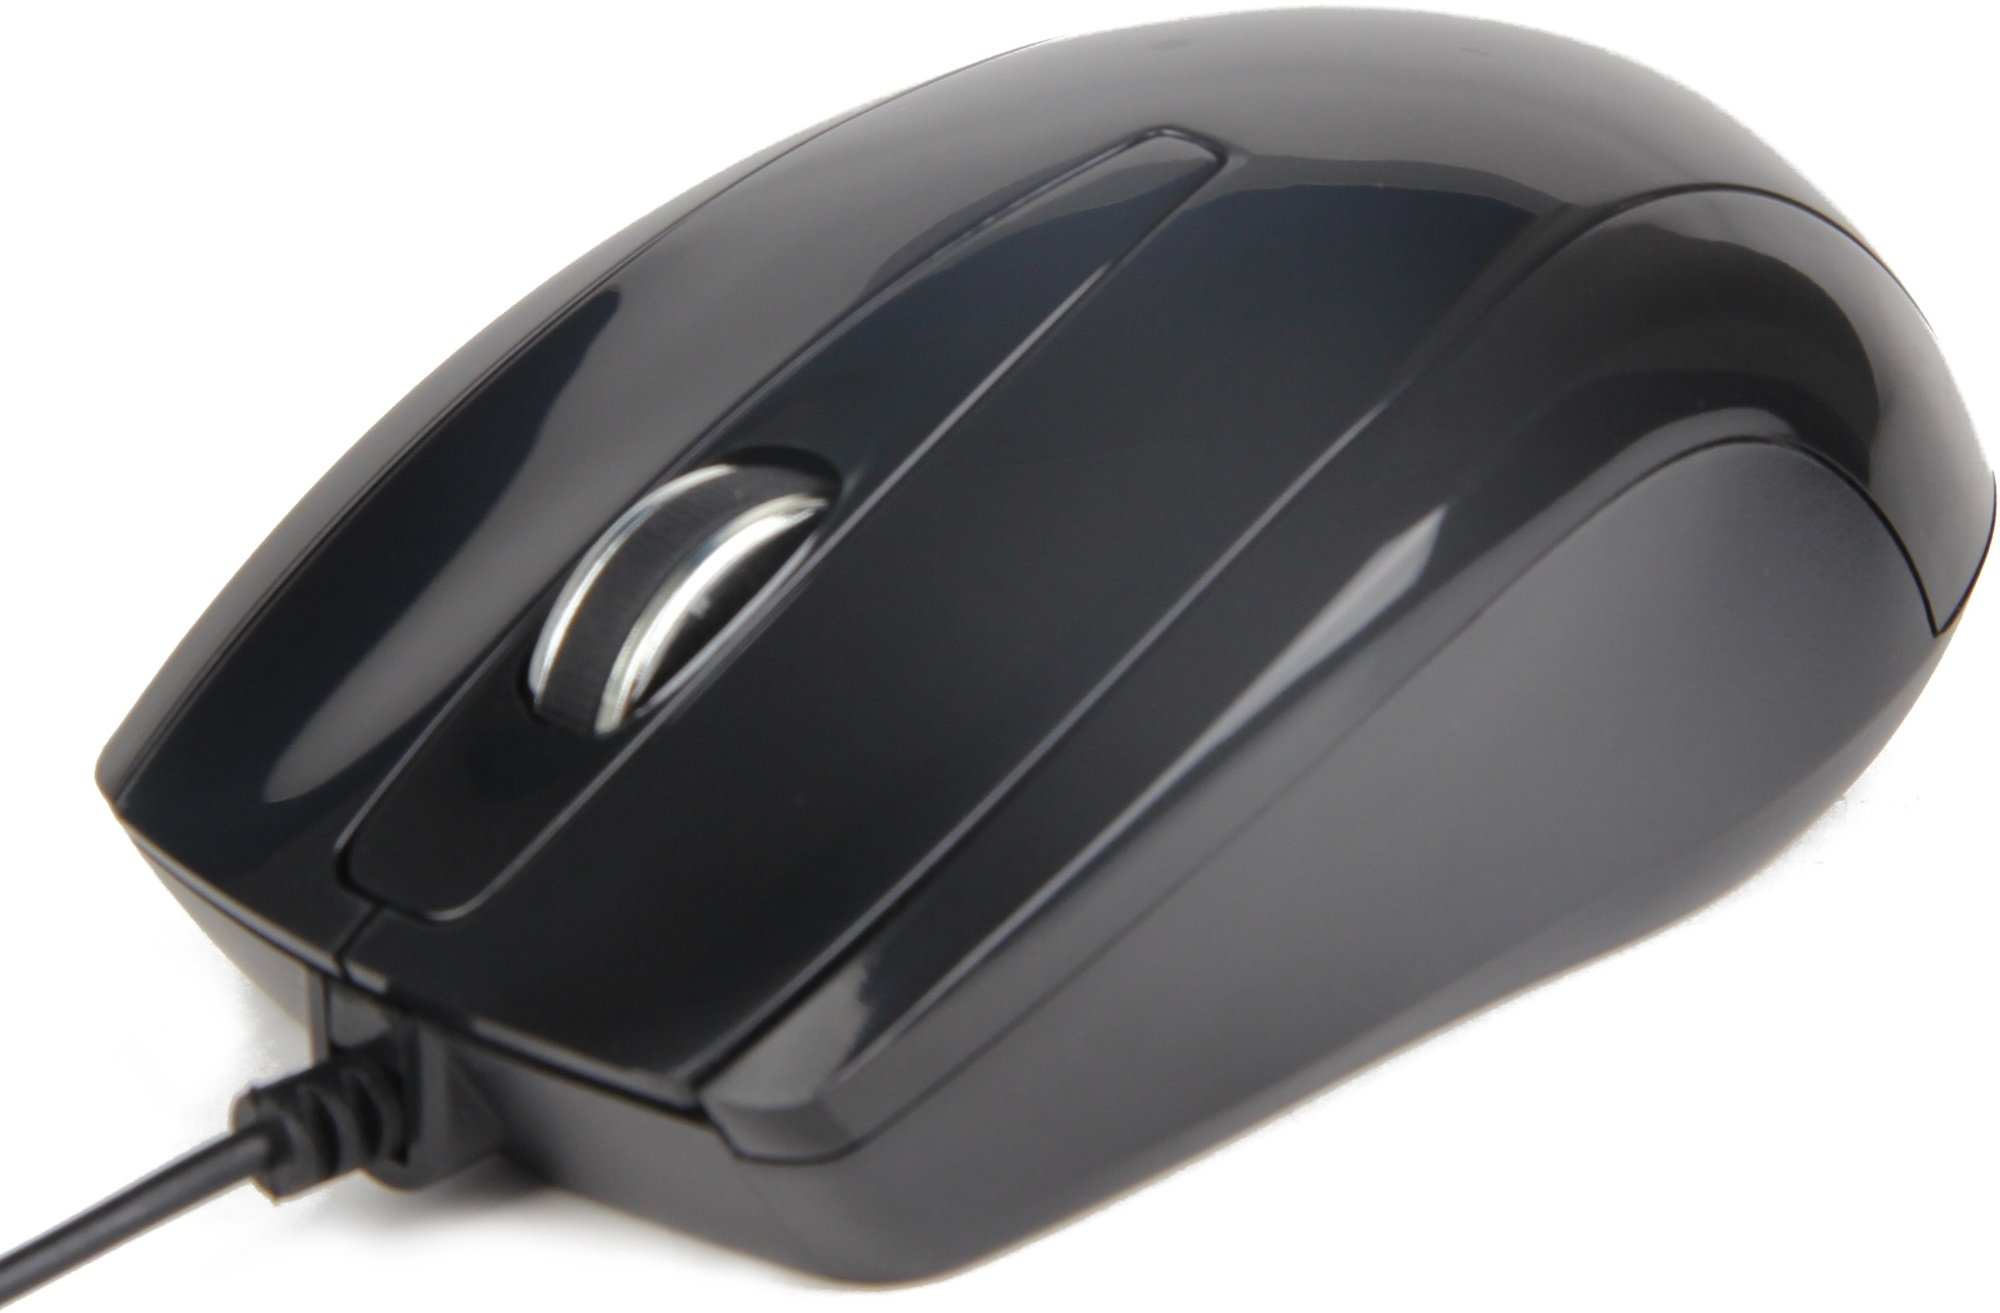 Drátová myš GEMBIRD MUS-U003 - černá